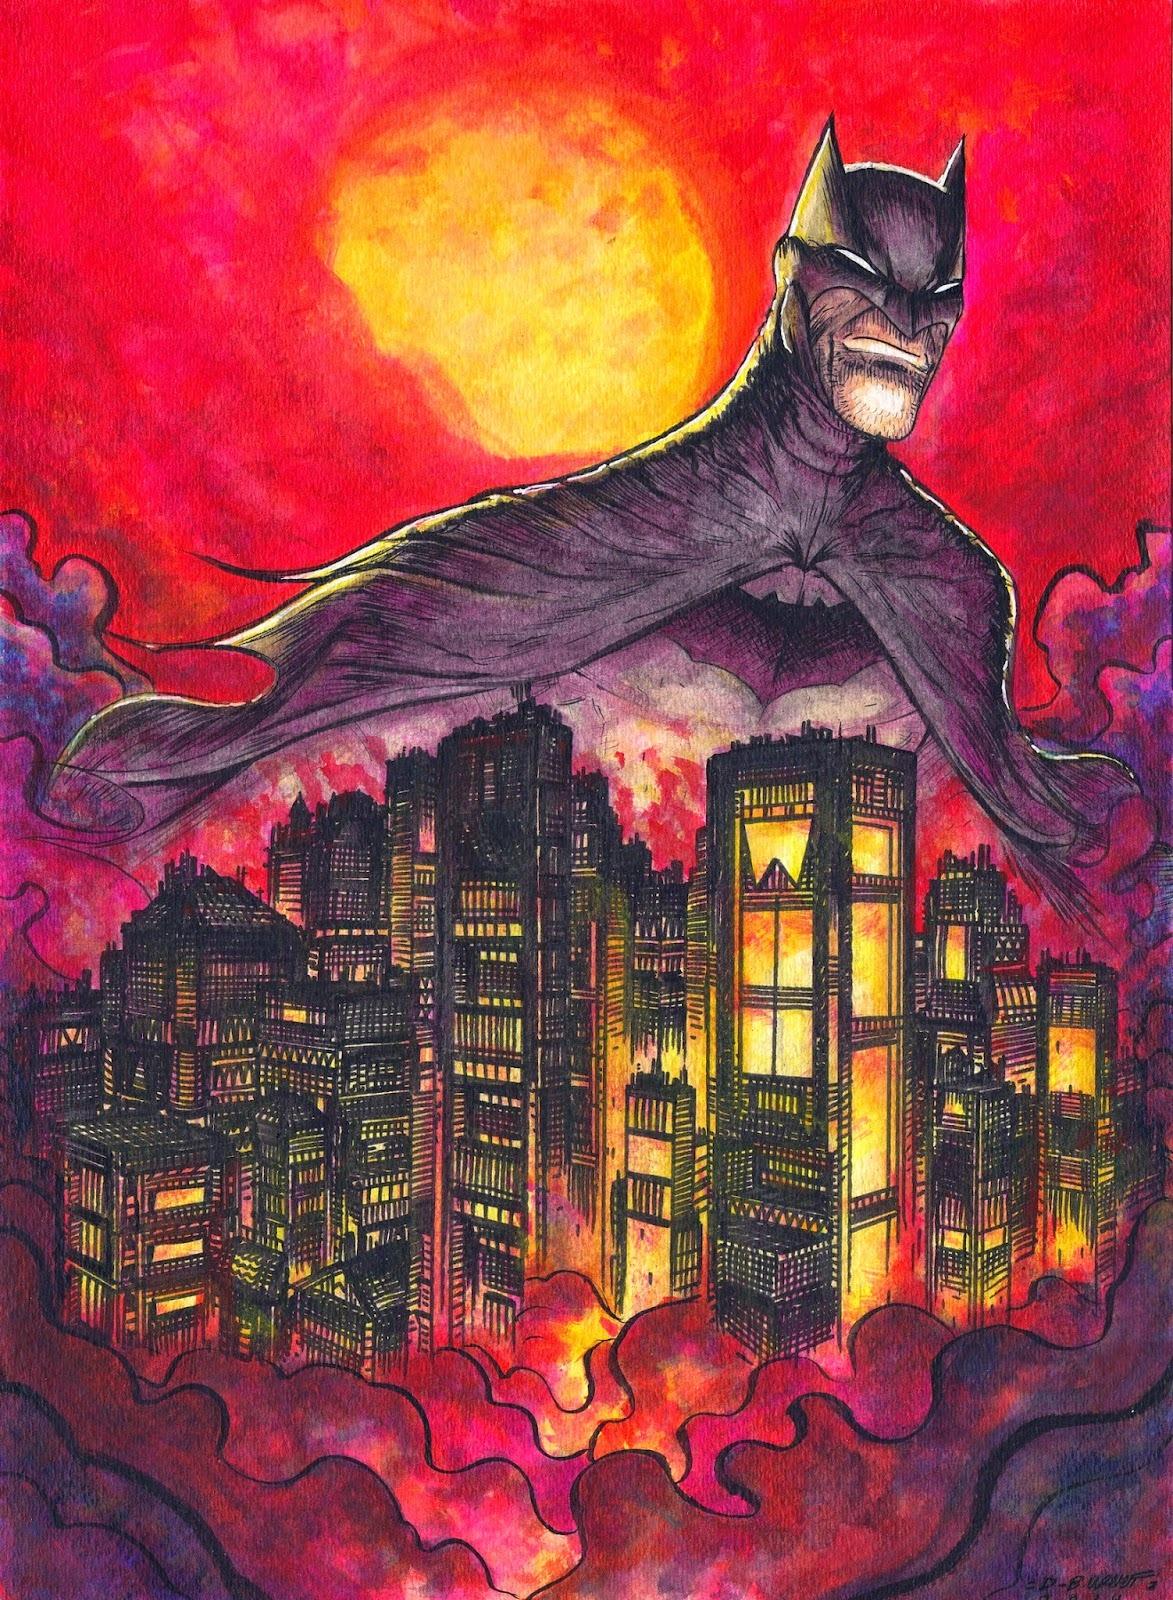 Gotham's Protector by Dylan Burnett